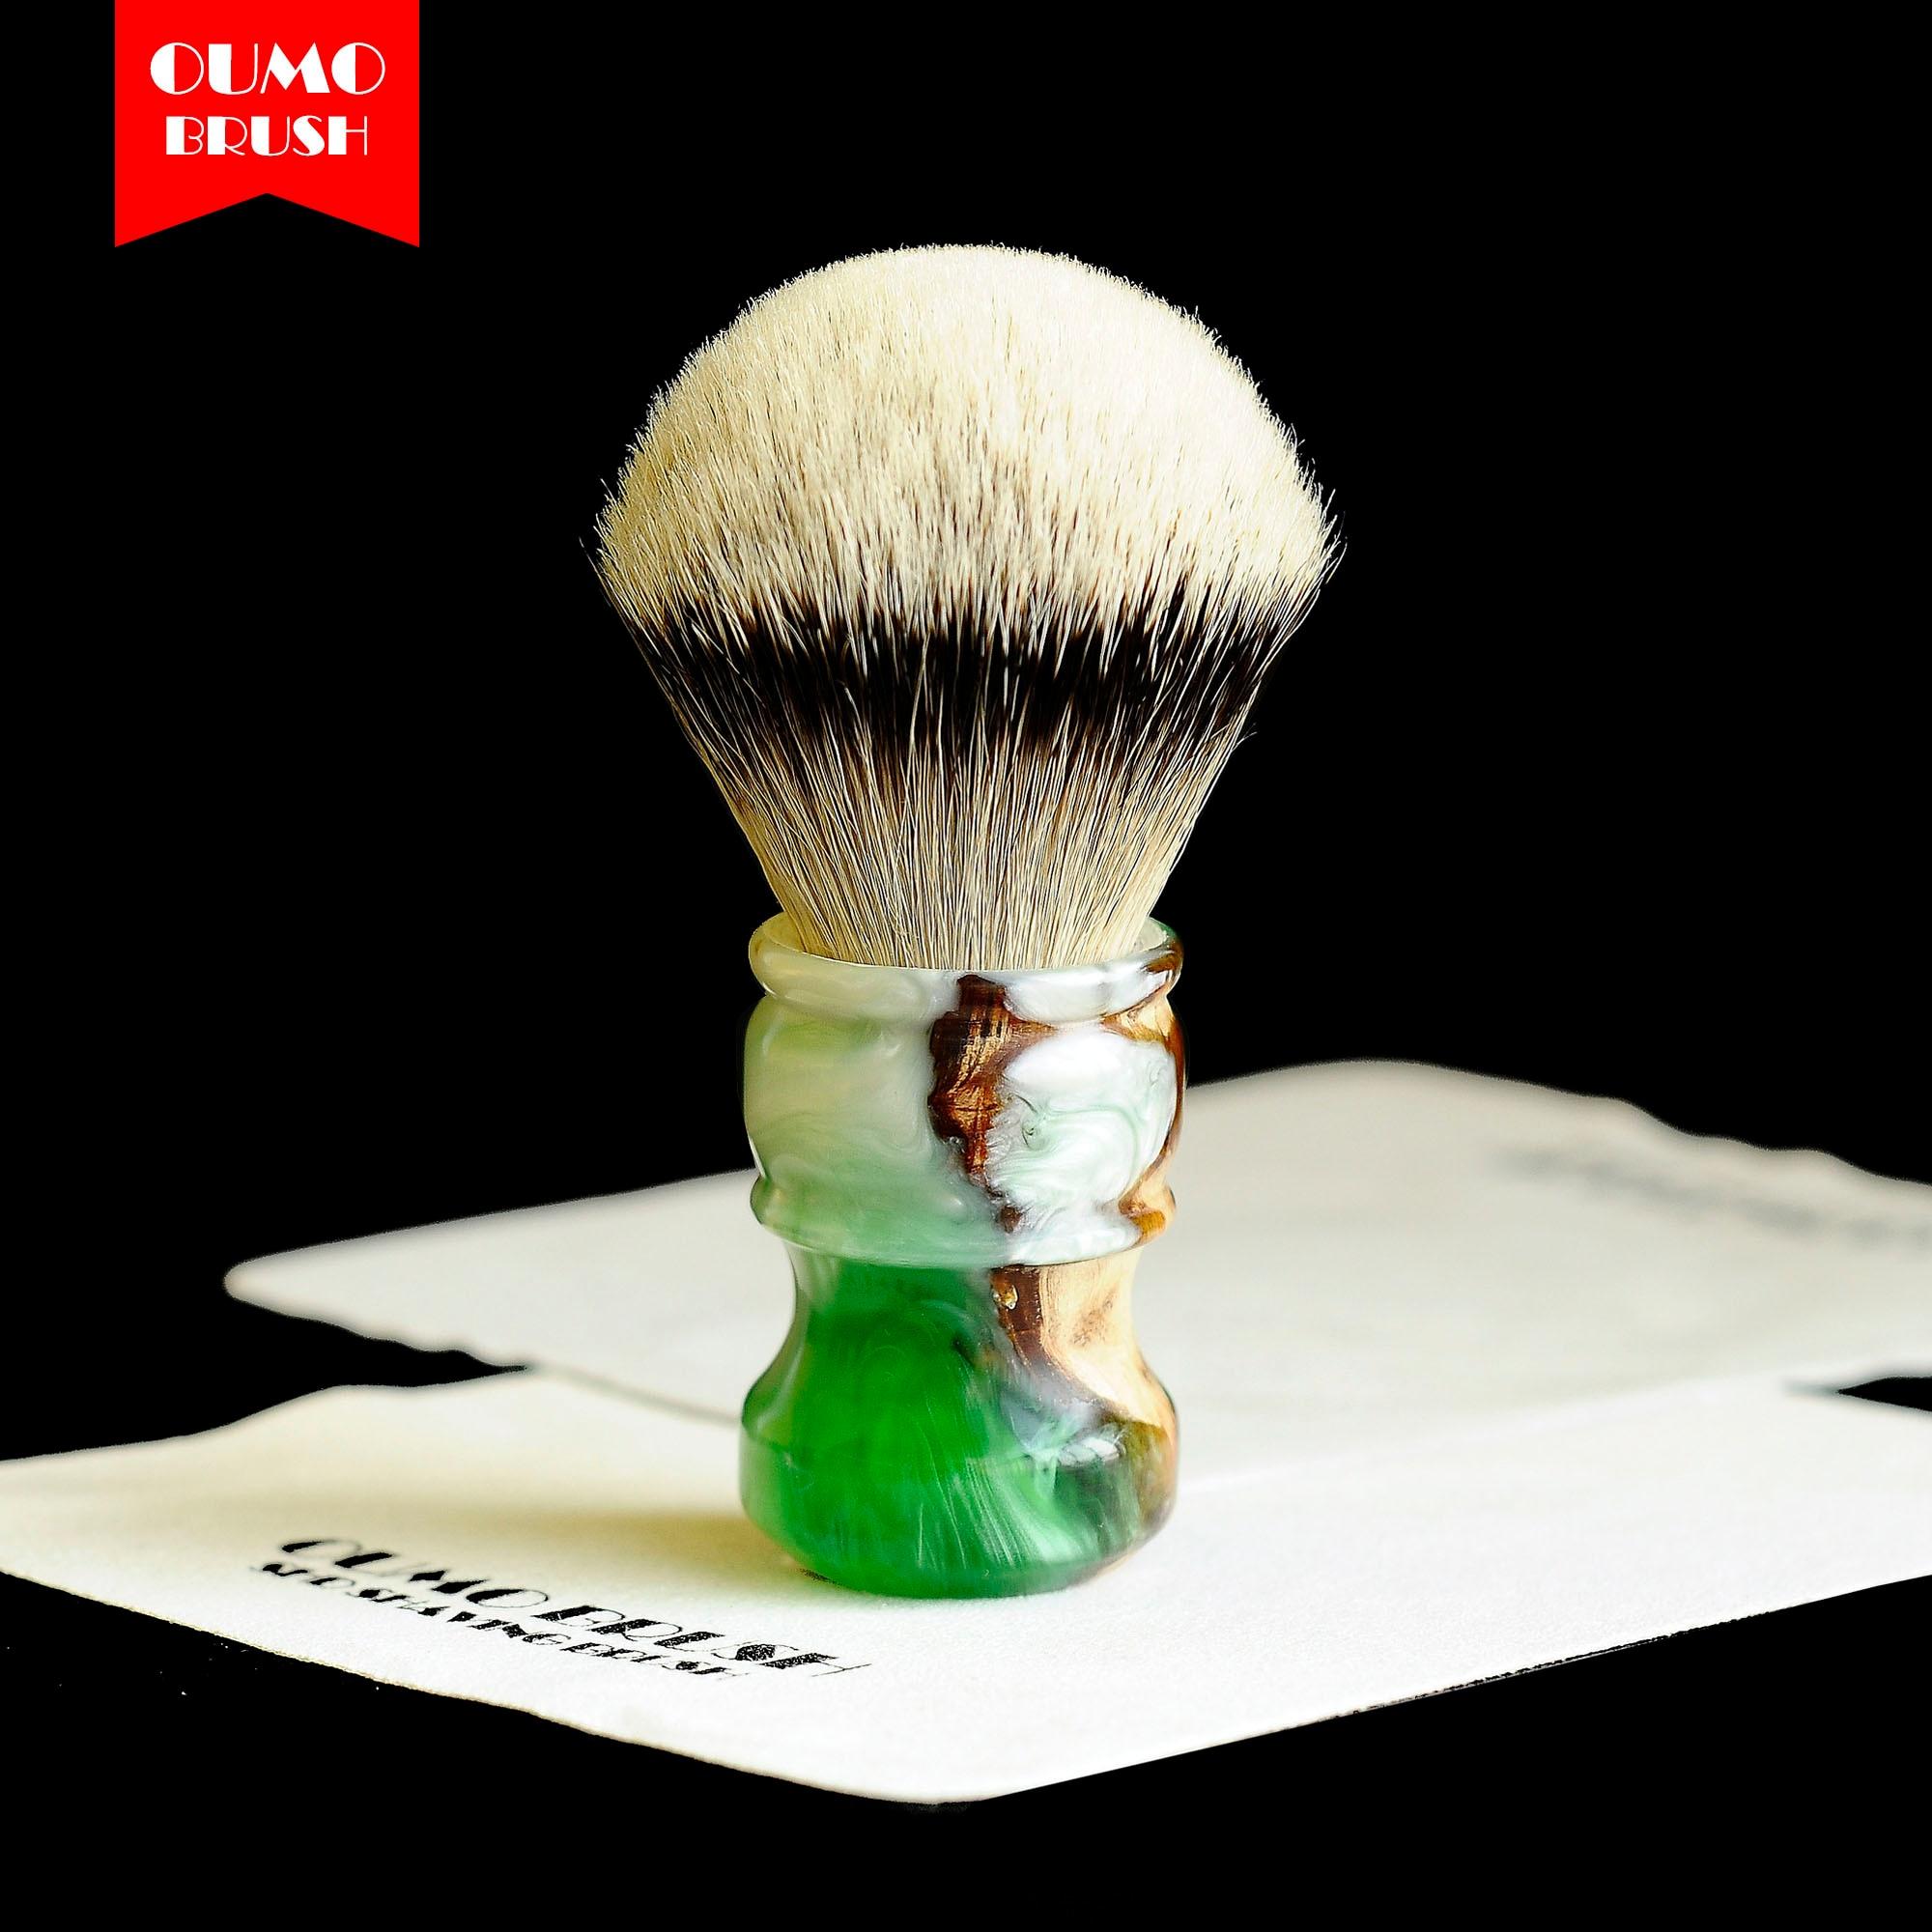 OUMO- sandal wood with resin SHD HMW silvertip badger knots shaving brush